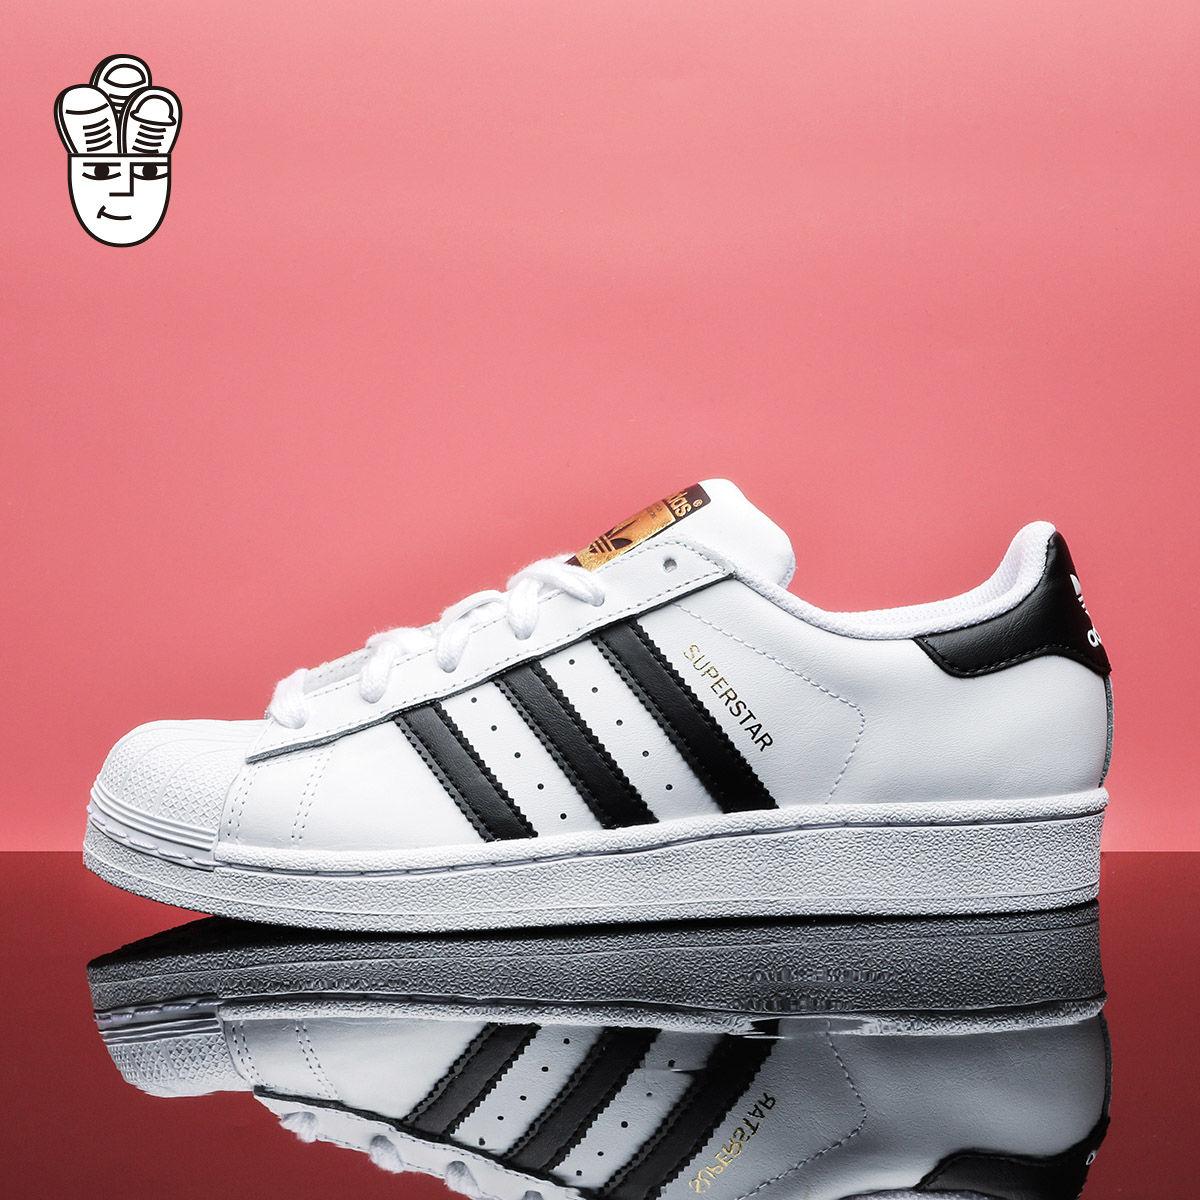 Adidas Superstar W 三叶草女鞋 经典全白贝壳头板鞋 运动休闲鞋